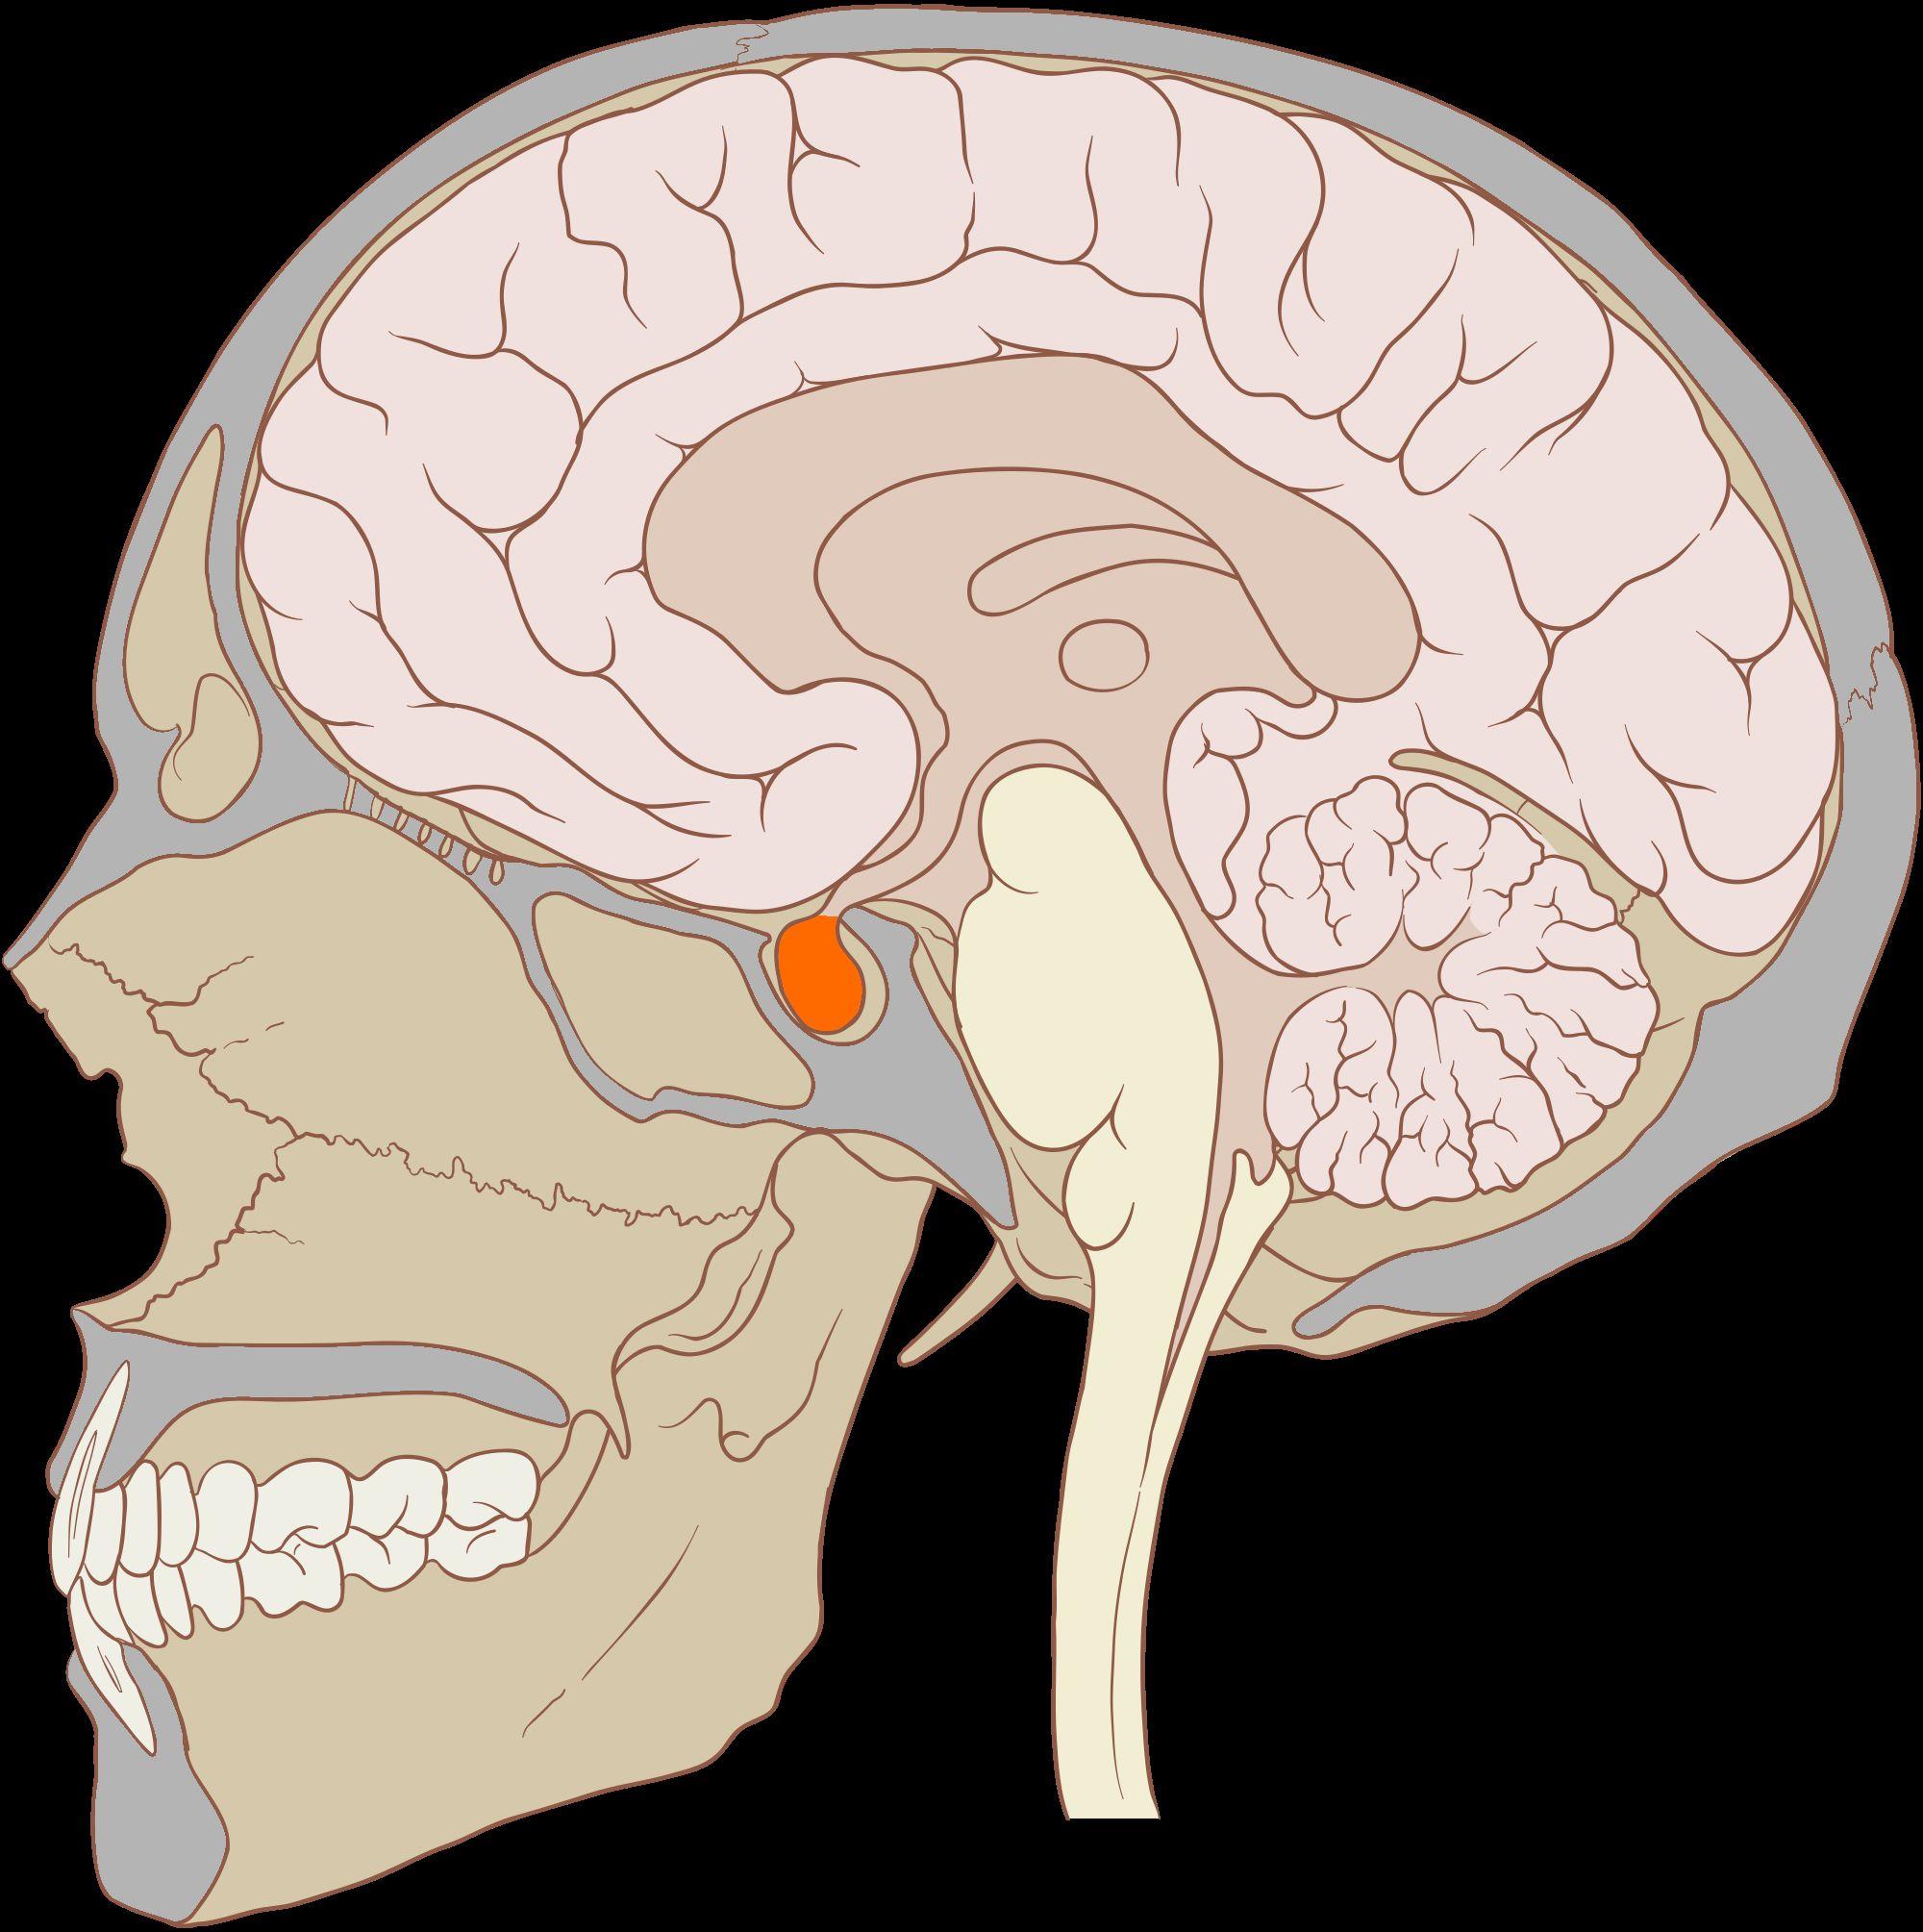 macroadénome hypophysaire symptomes